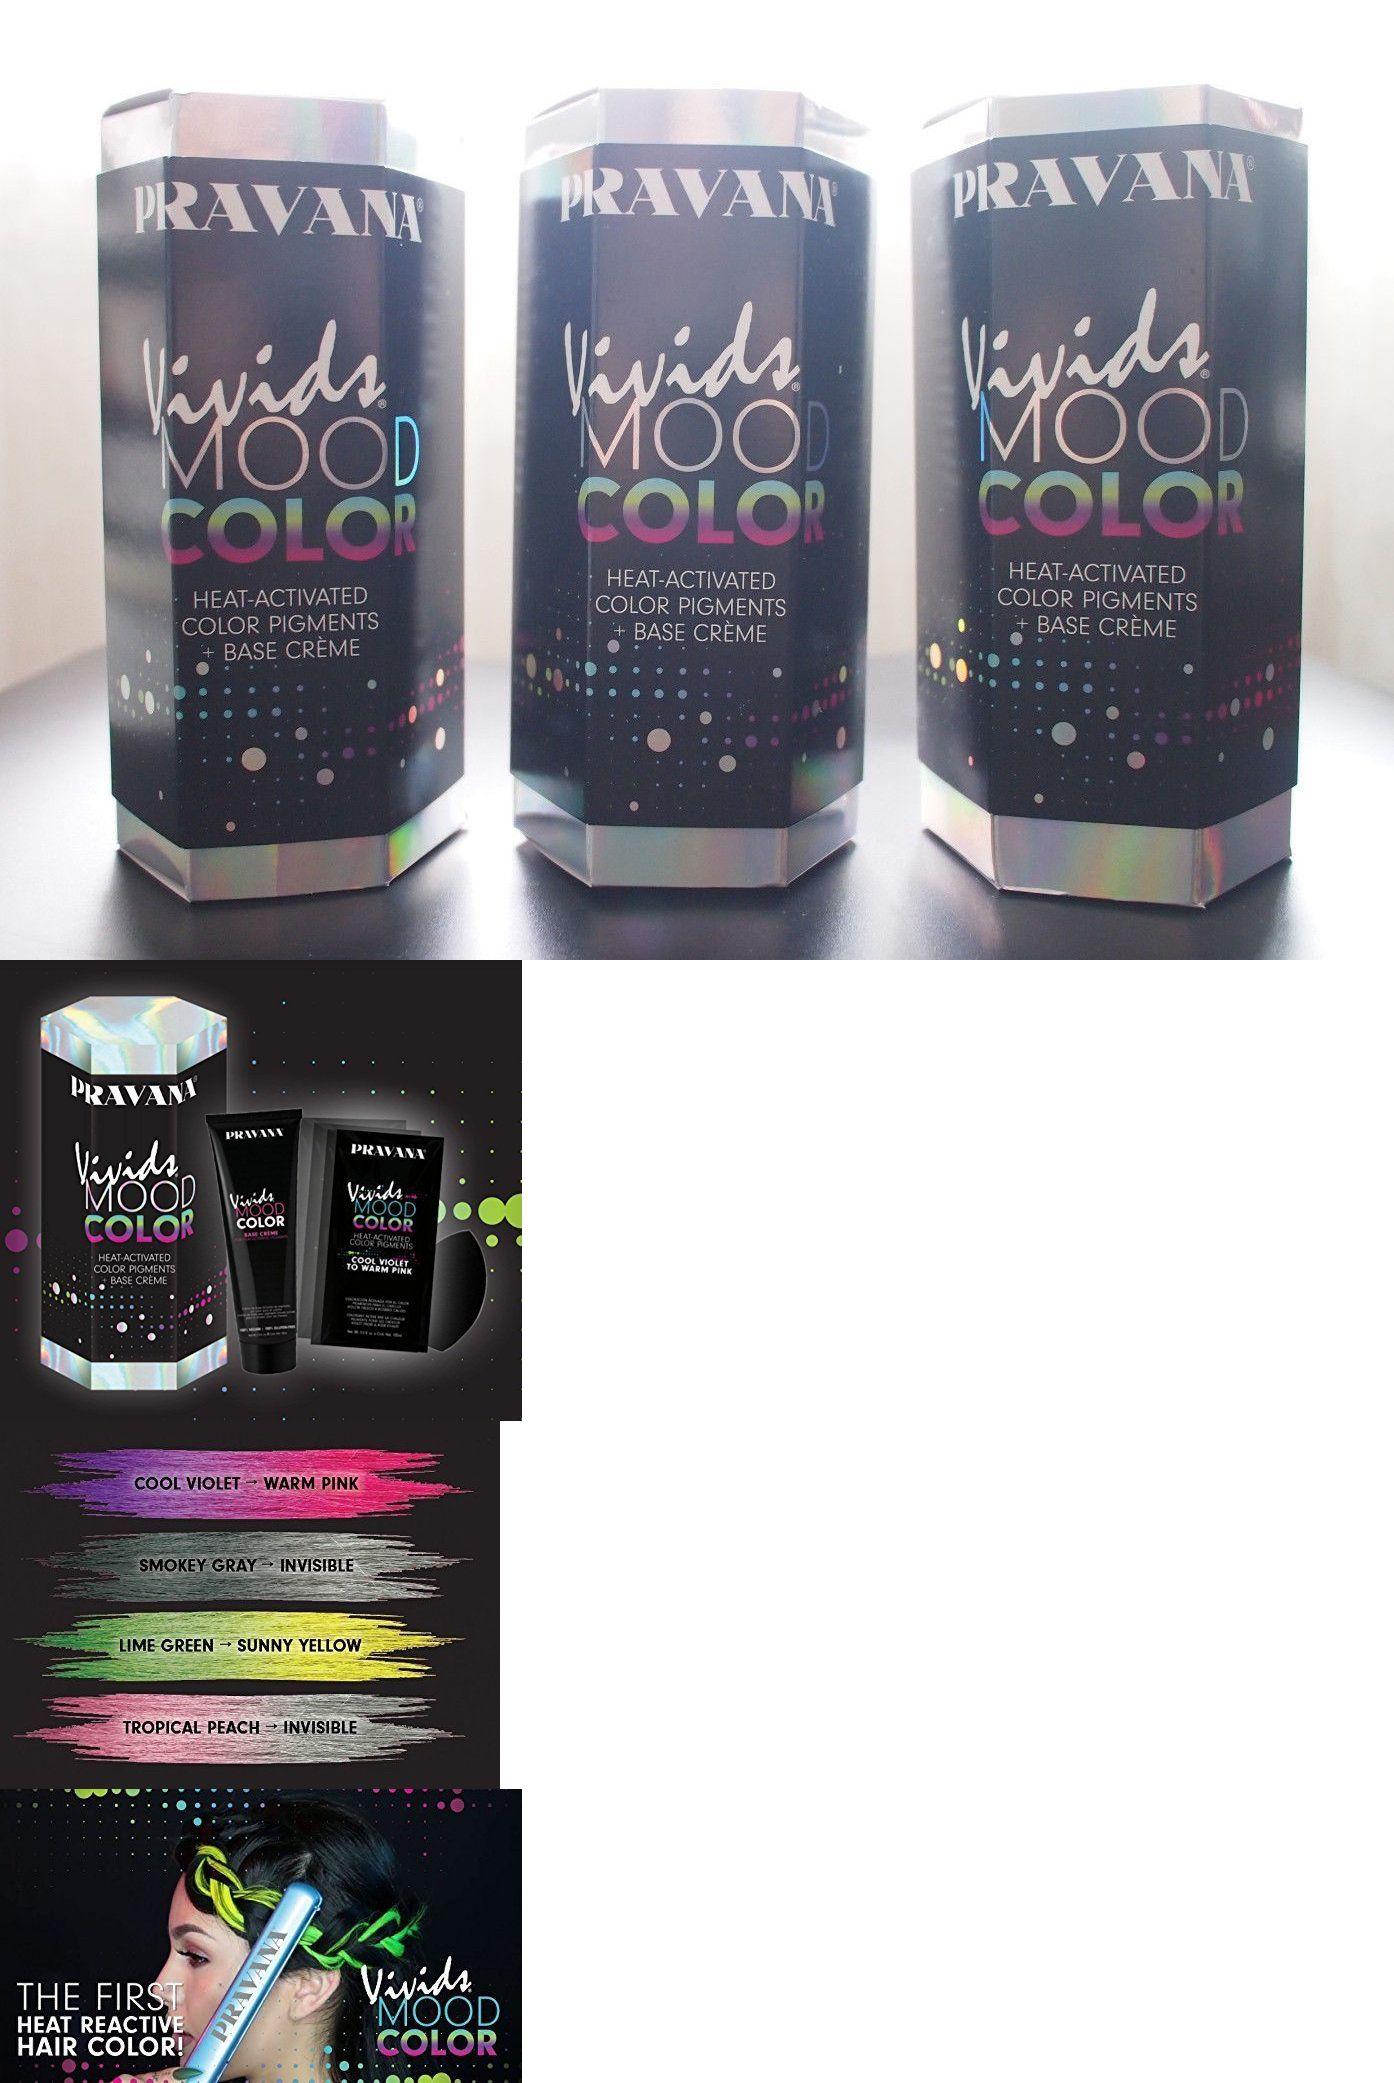 Hair Color New Pravana Vivids Mood Heat Activated Hair Color Kit